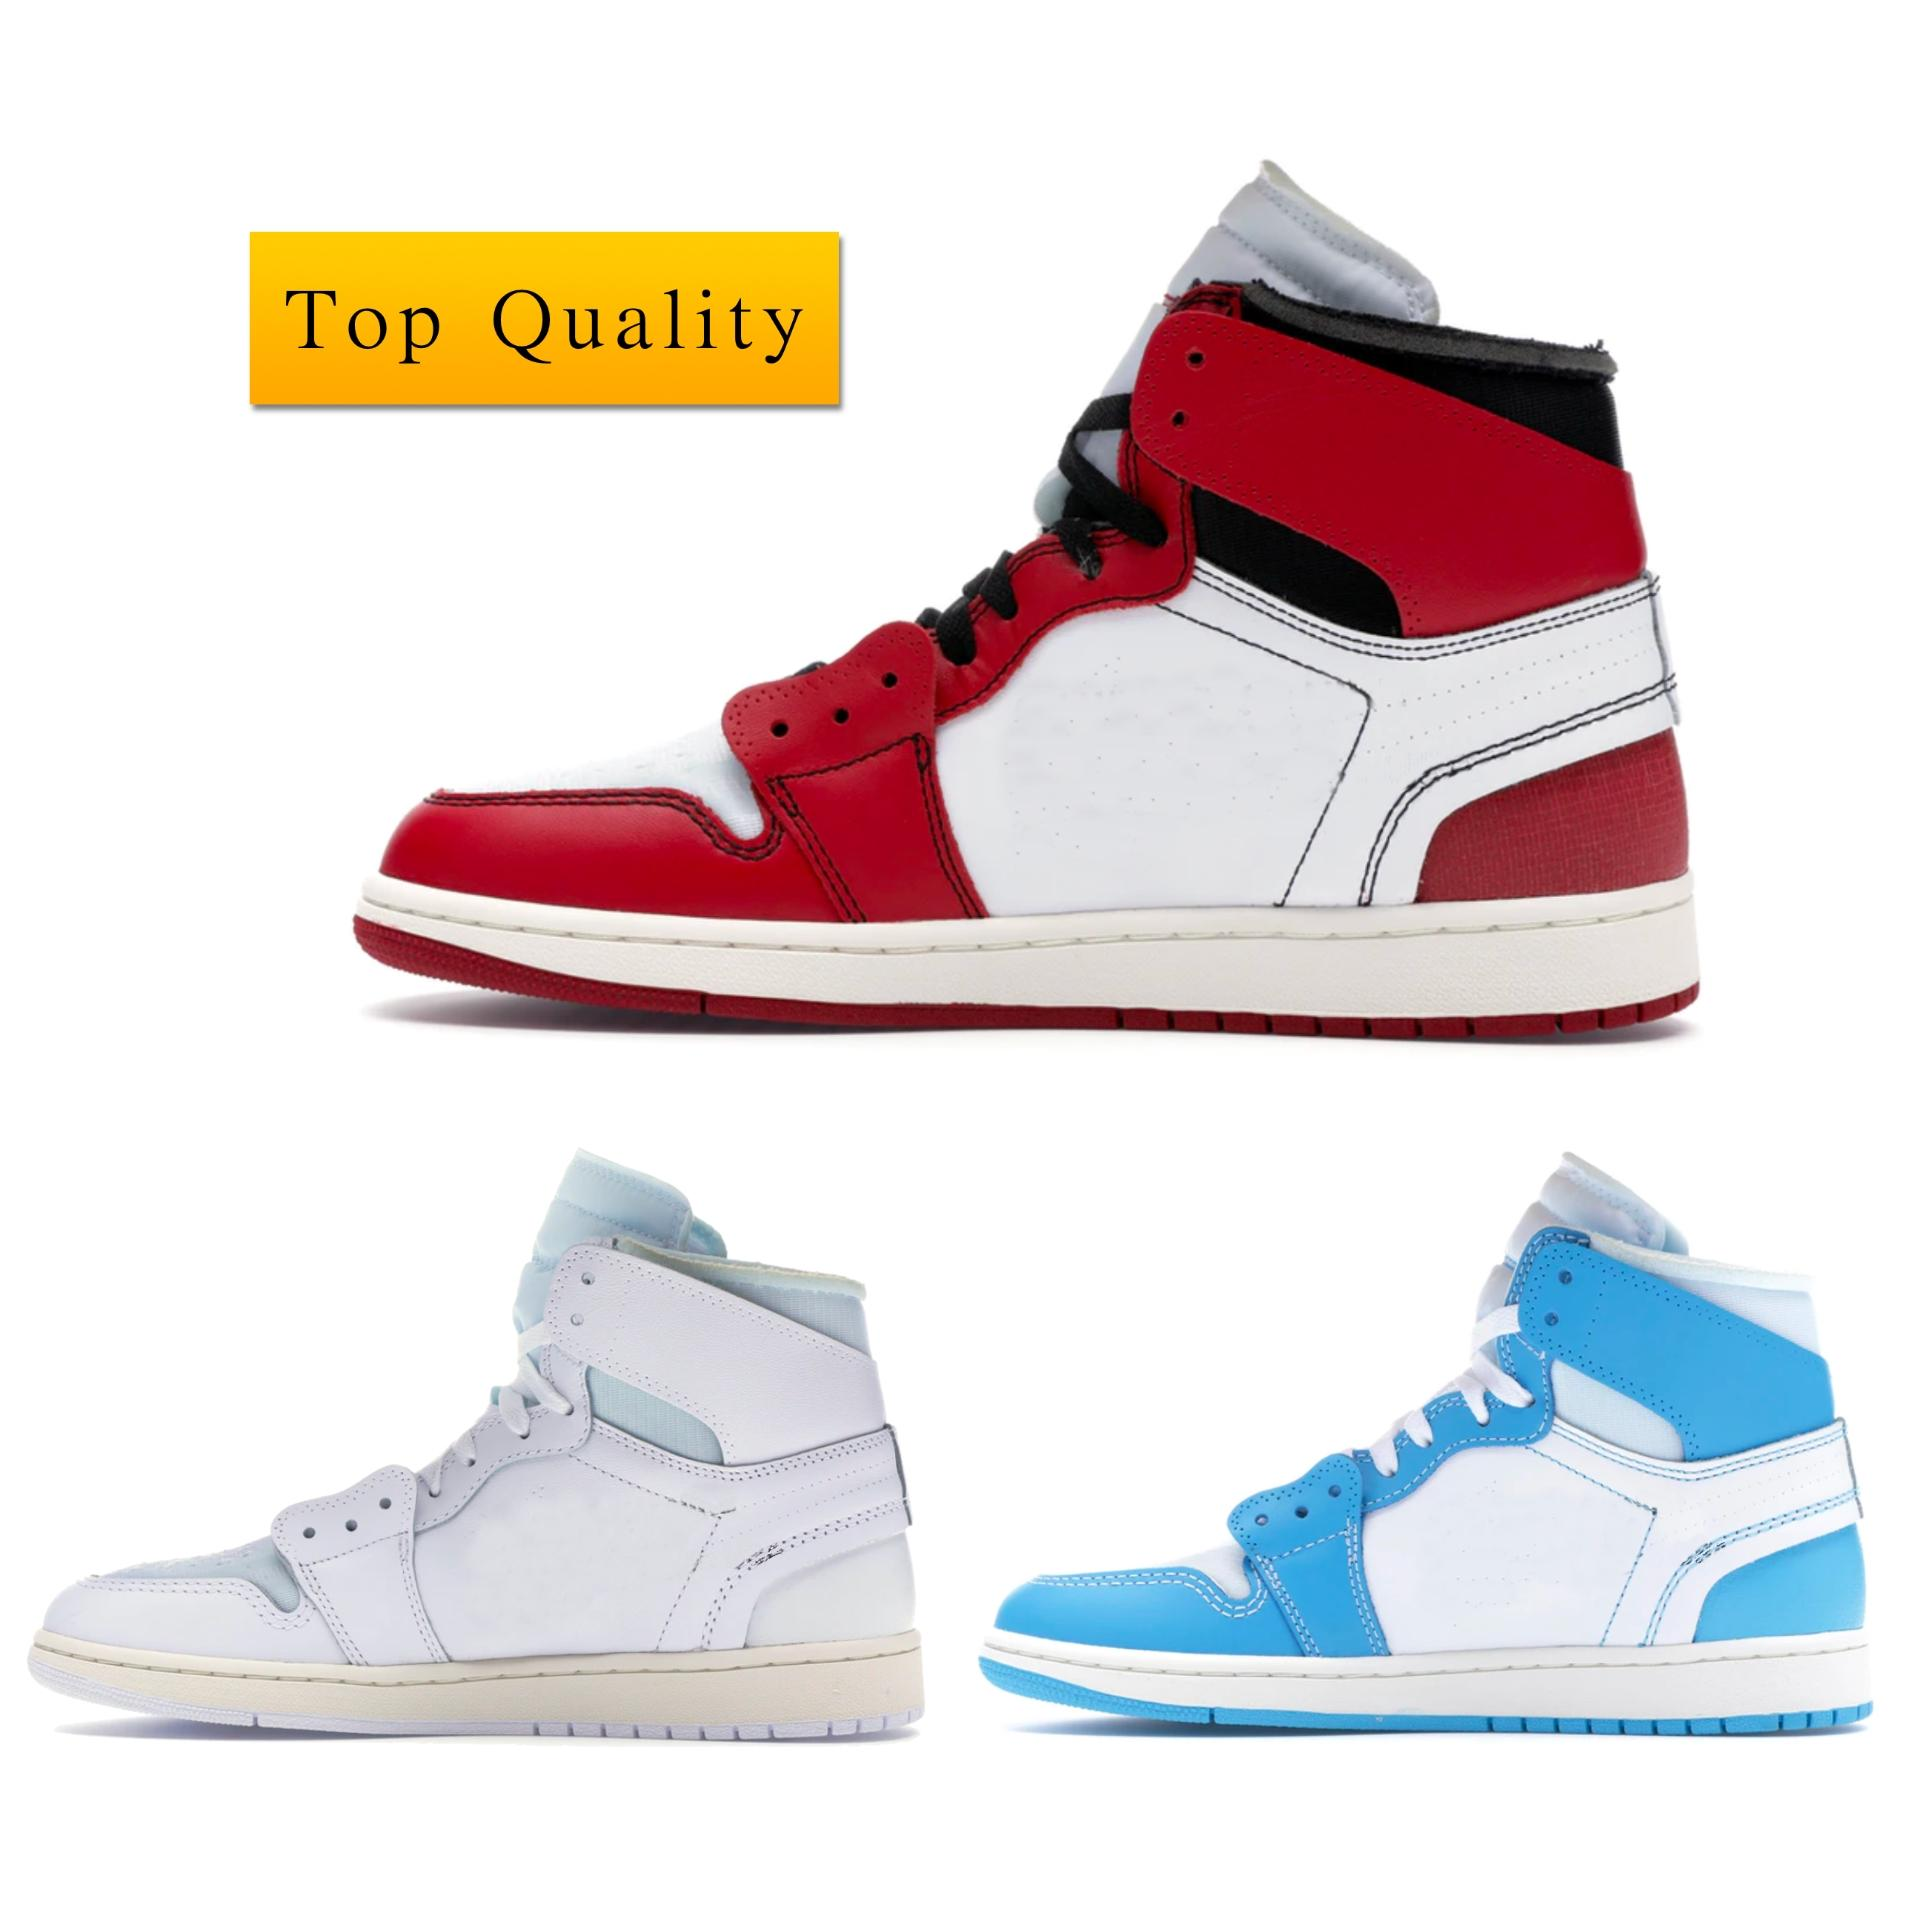 Air Jordan 1 Retro High University Blue 85 Chicago Basketball Shoes بلو شيكاغو 85 نساء لكرة السلة أولي الرياضة في الهواء الطلق مع صندوق الولايات المتحدة 5،5 حتي 12